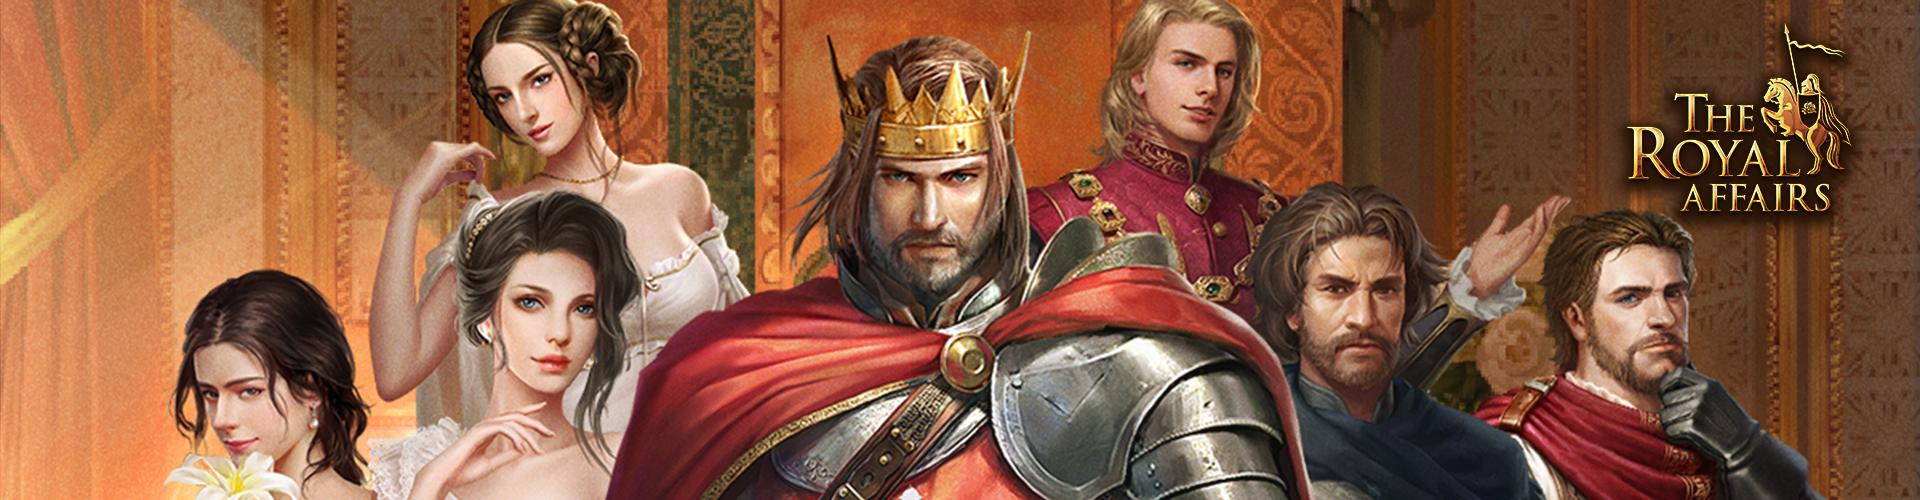 The Royal Affairs